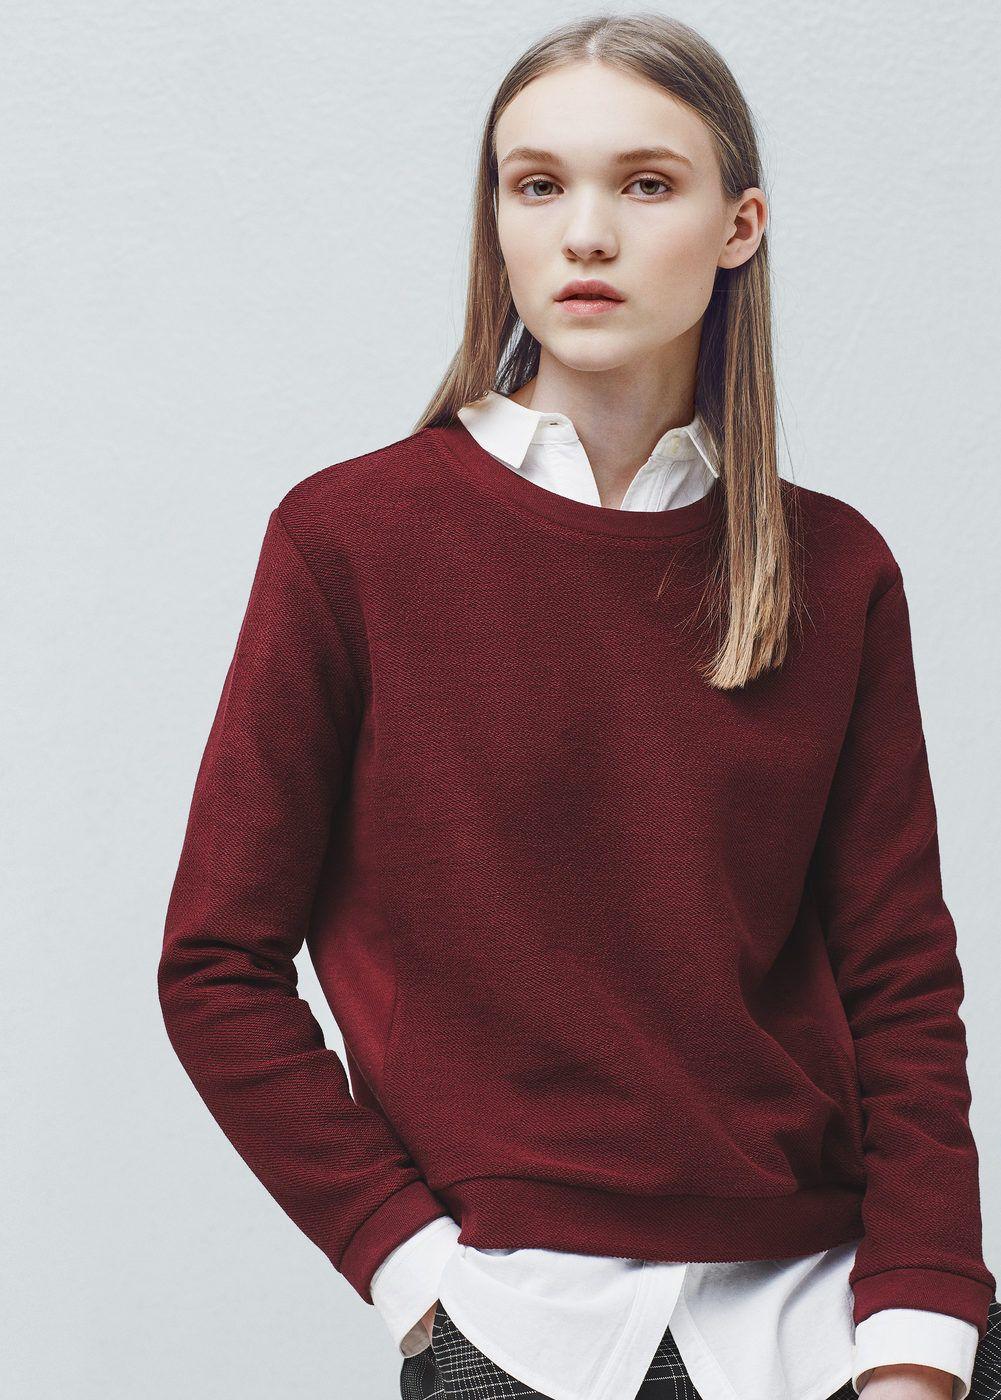 best sneakers 418da b4013 Strukturiertes baumwoll-sweatshirt - Damen   new style ...